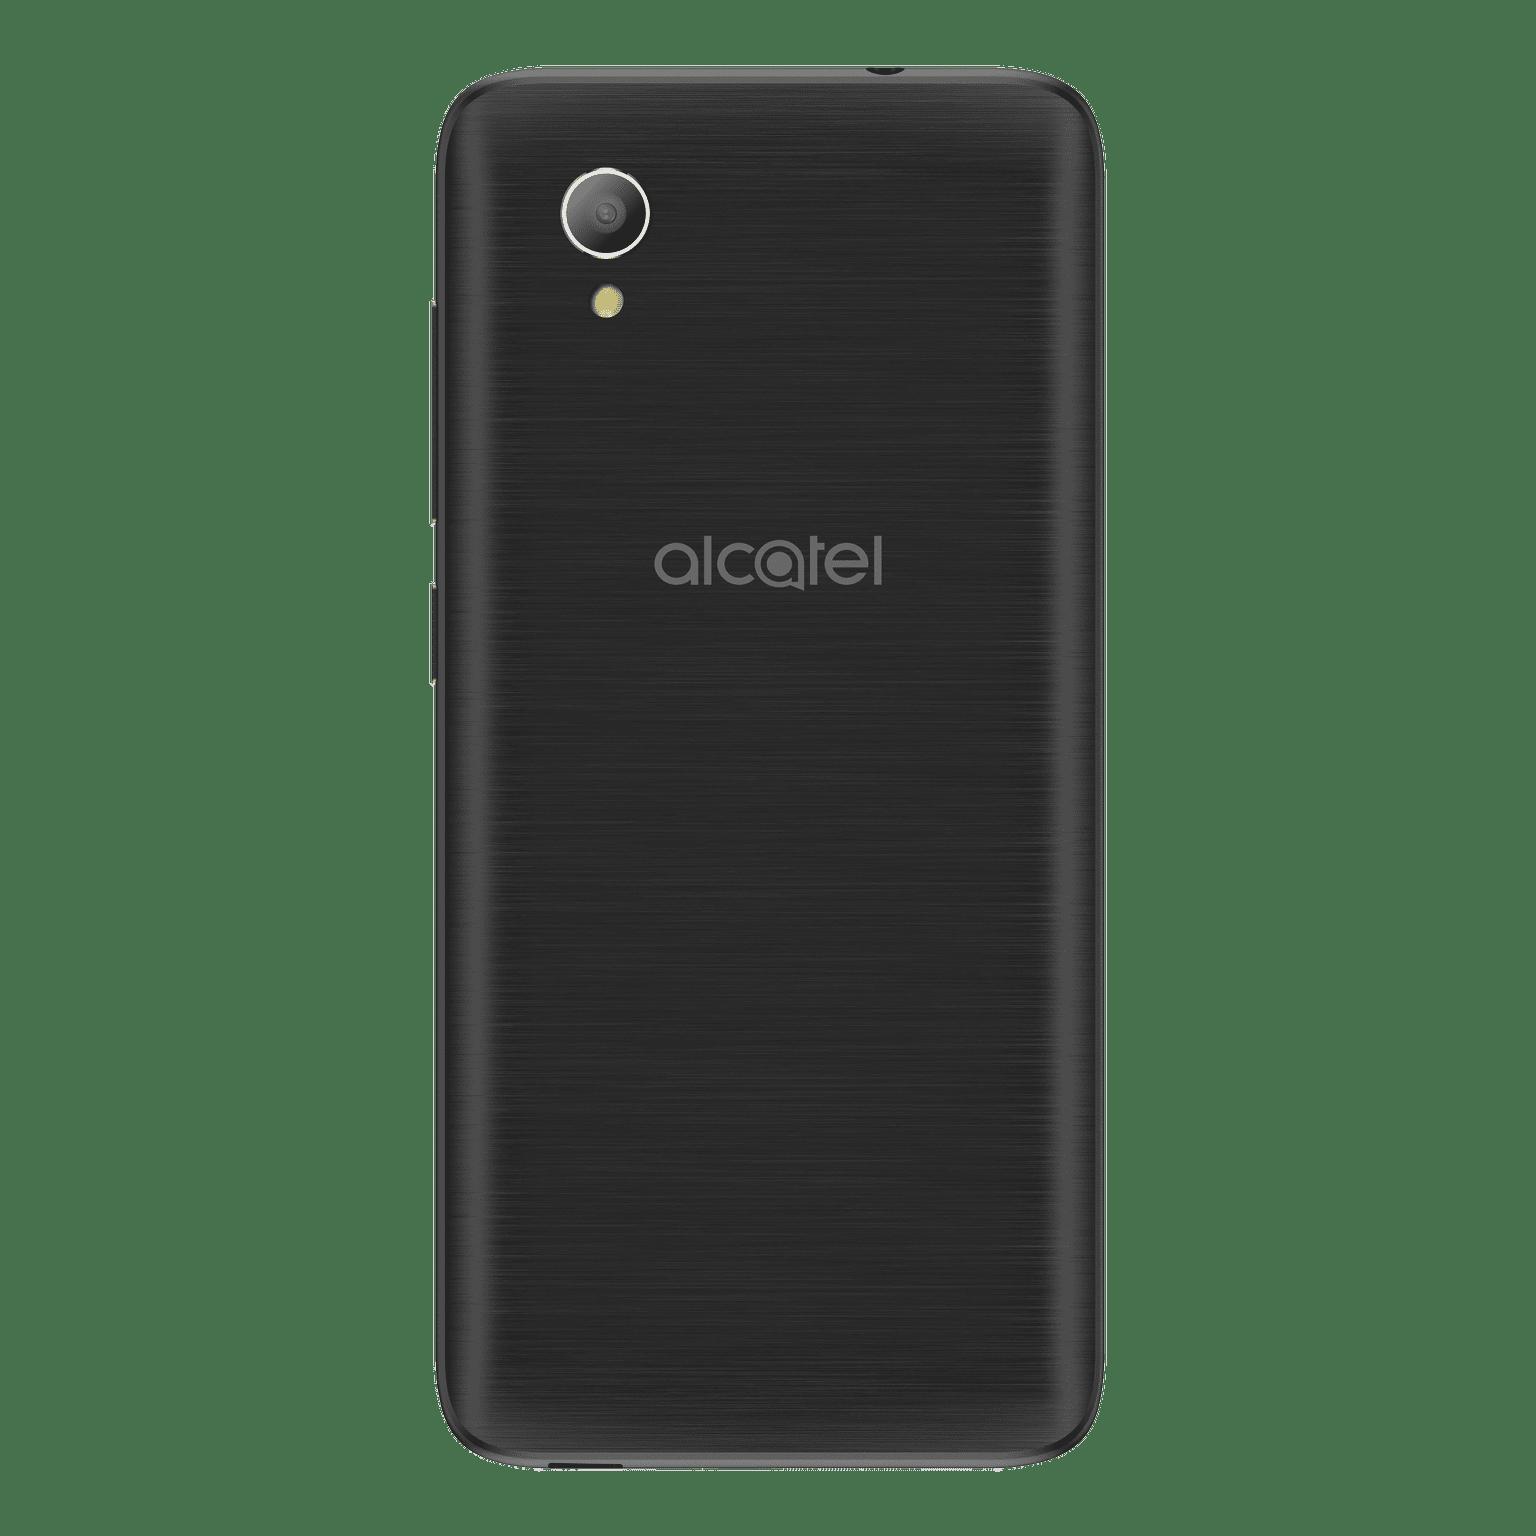 Alcatel выпустил смартфон Alcatel 1 на Android Go (thBUMzjg)